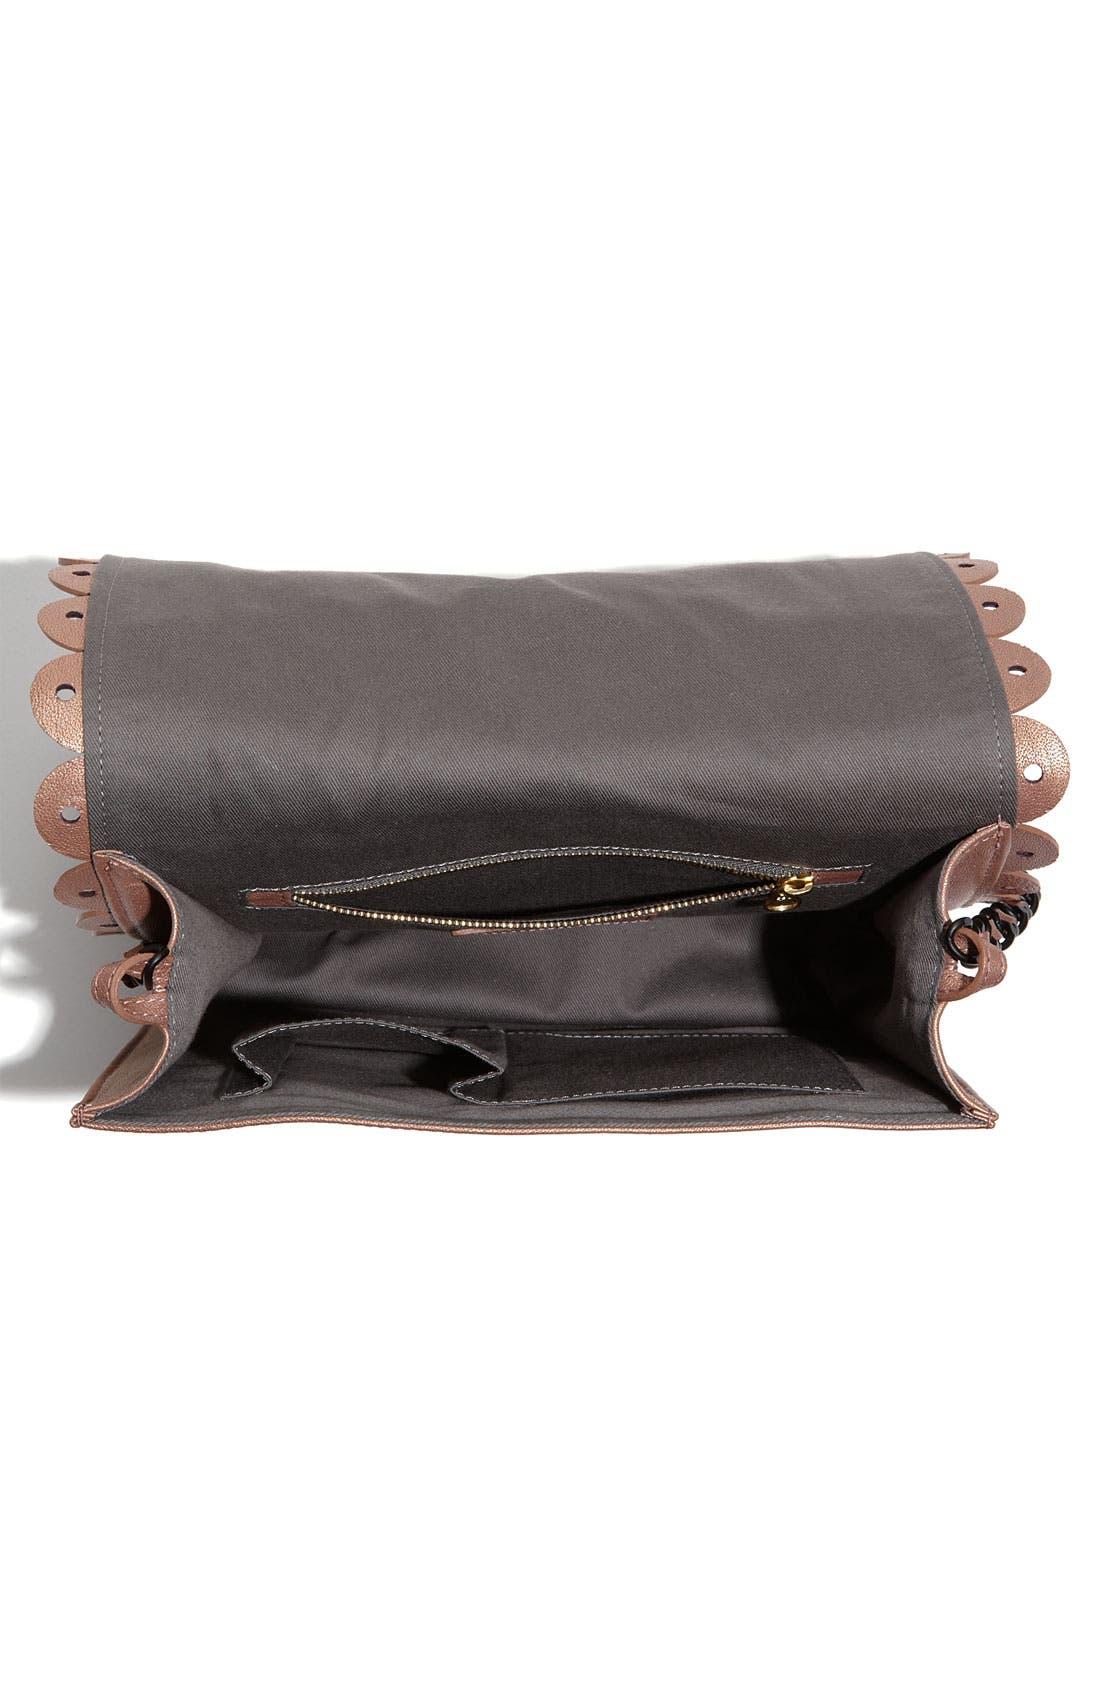 Alternate Image 3  - See By Chloé 'Poya Vintage - Large' Metallic Leather Satchel